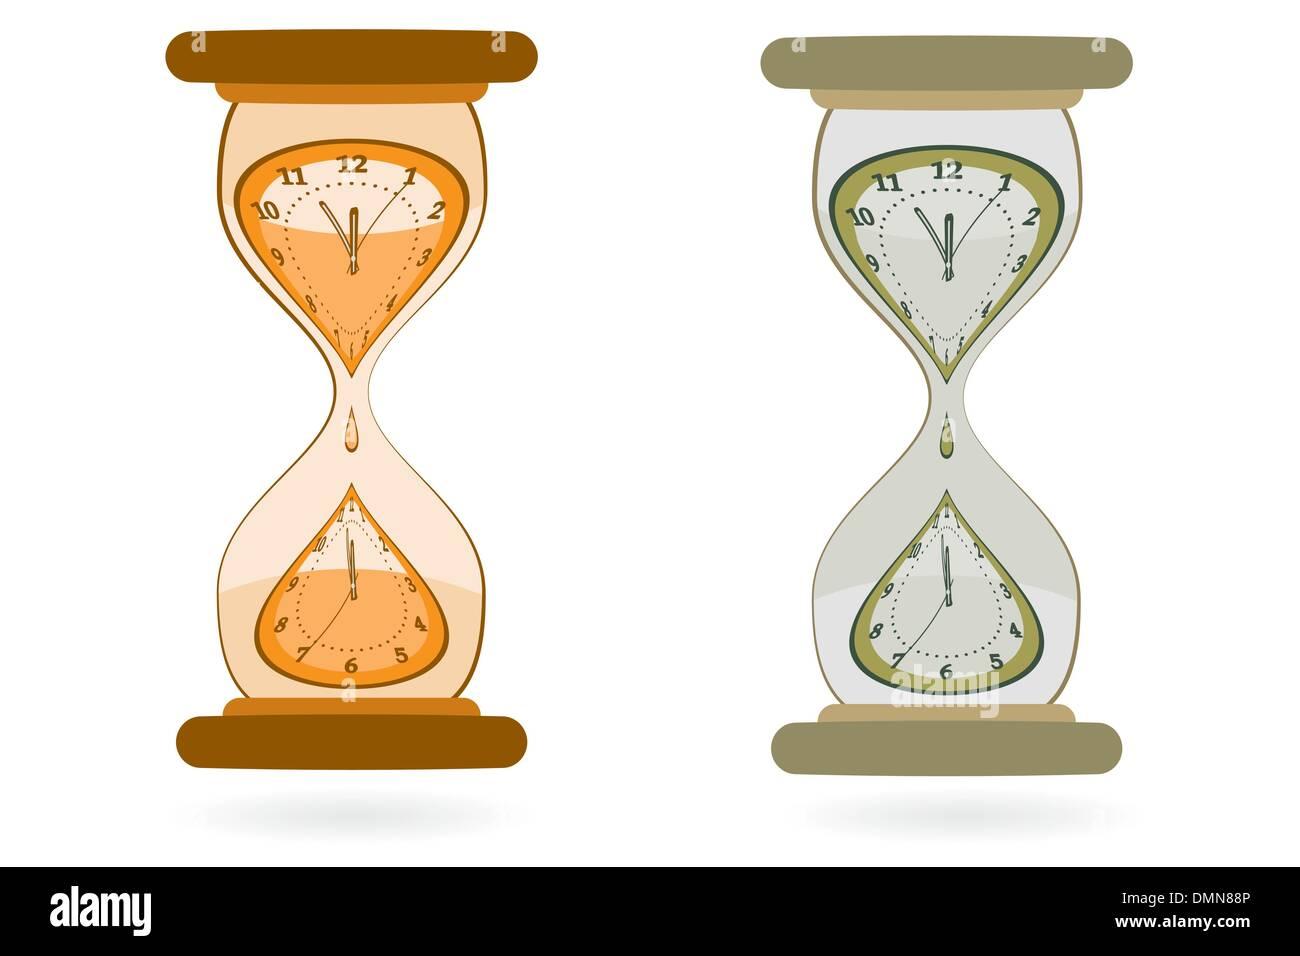 Hourglass with Wall Clocks - Stock Image